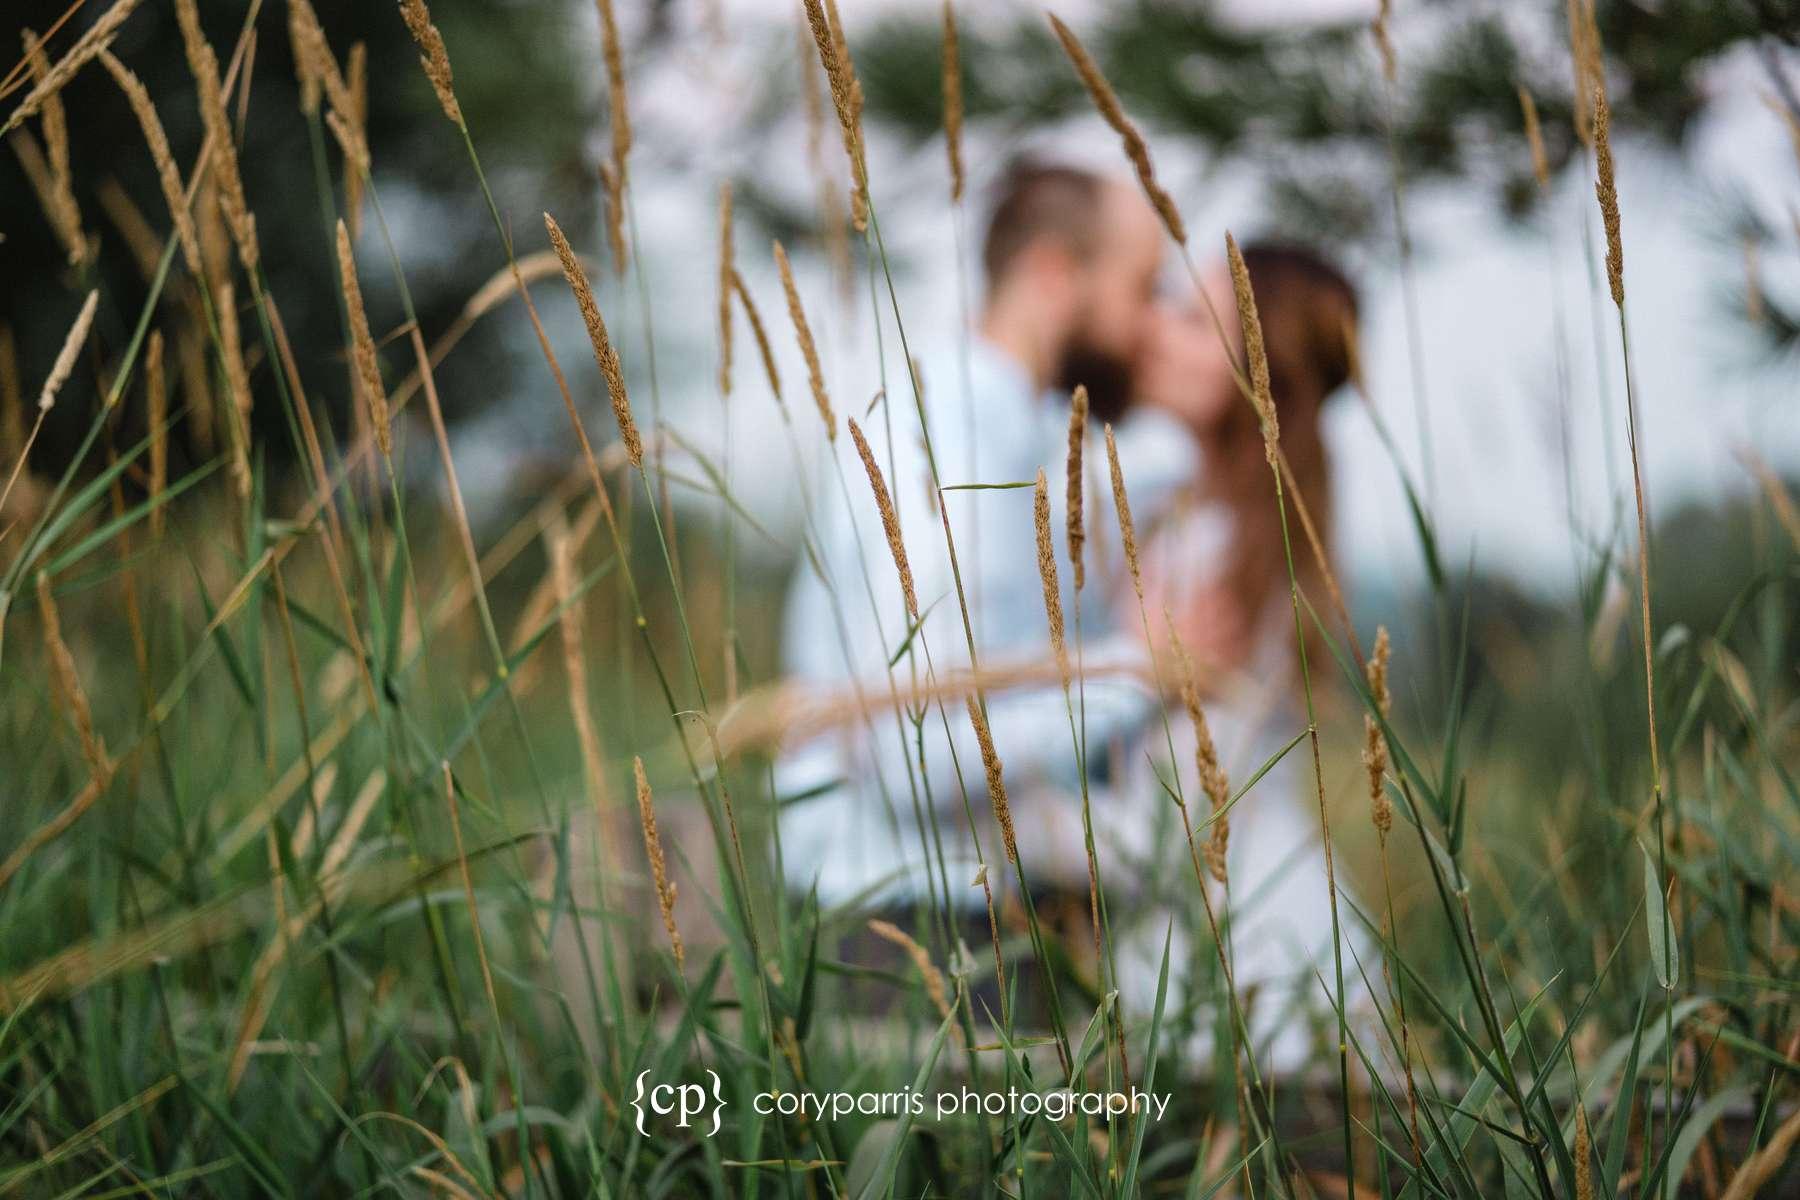 082-Engagement-Portraits-Marrymoor-Park.jpg